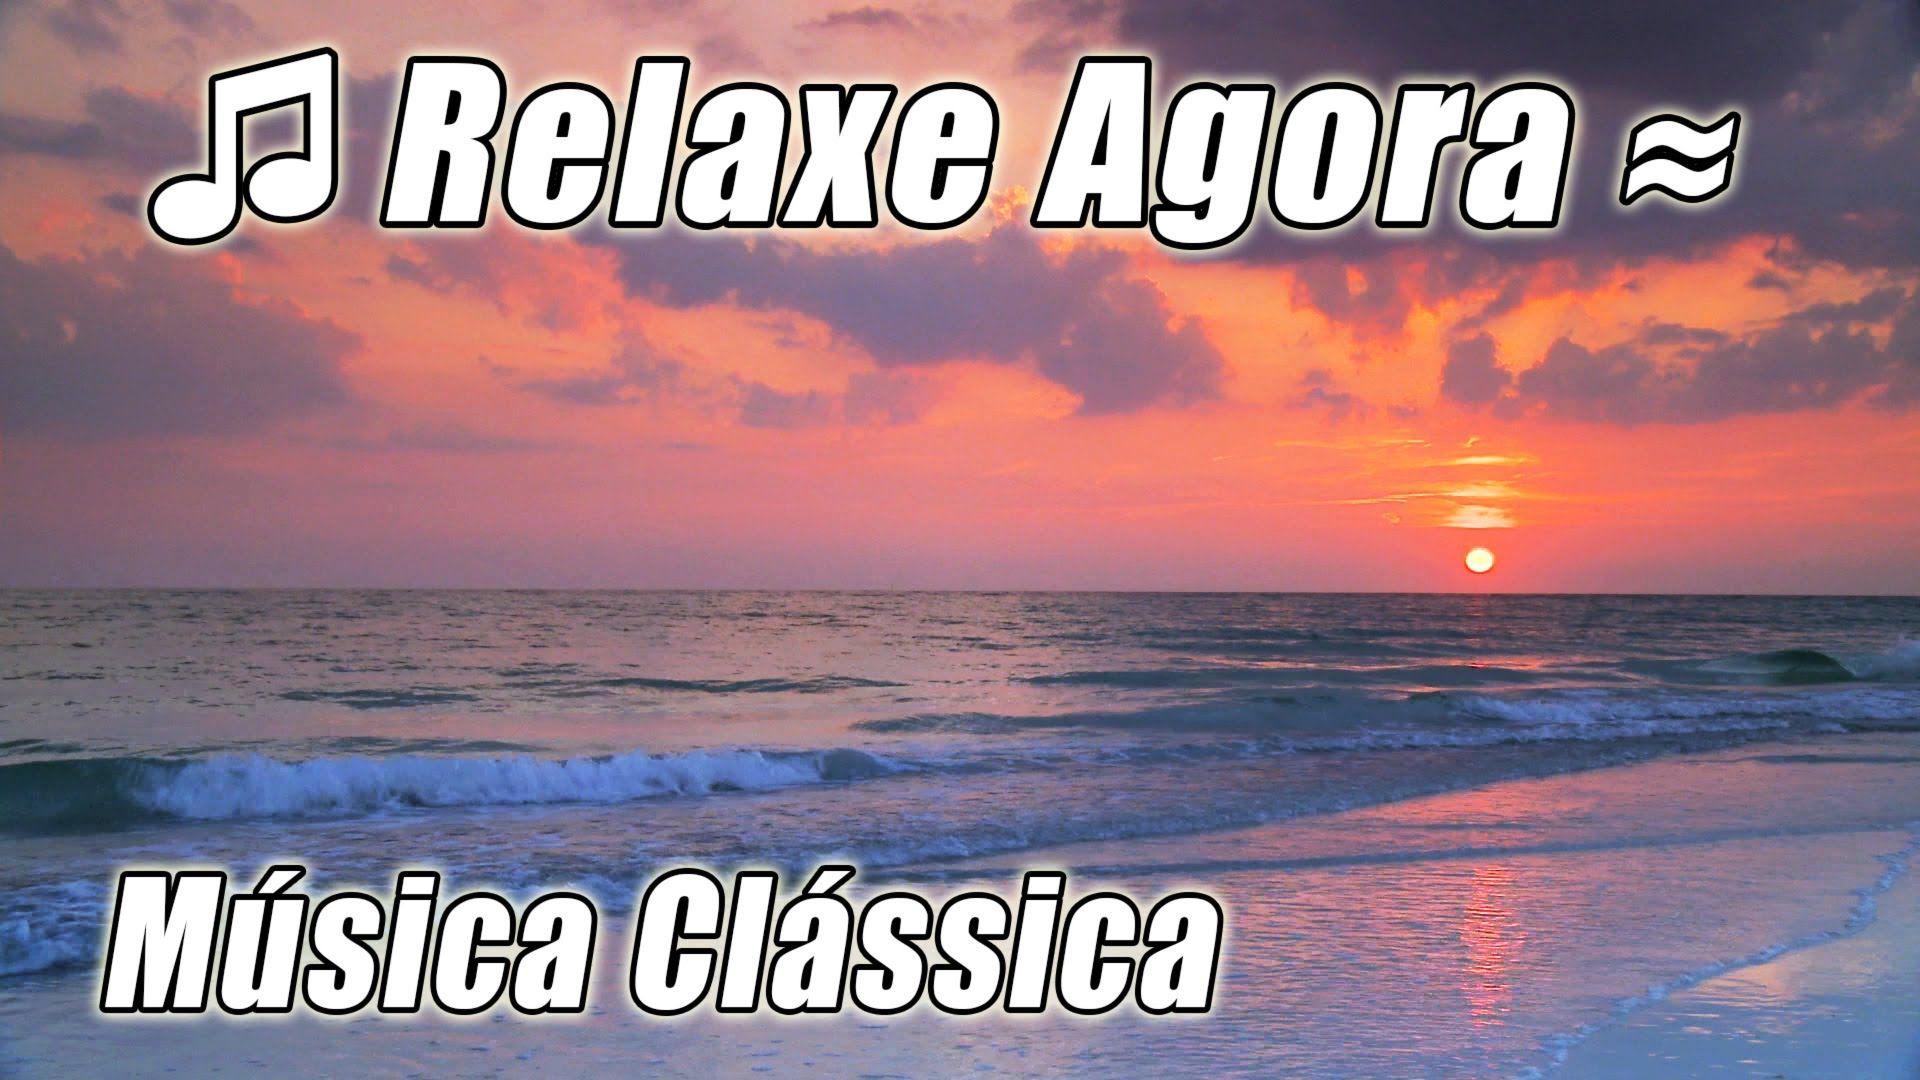 Musica Classica Para Estudar 1 Lista De Estudo Musica Calmante